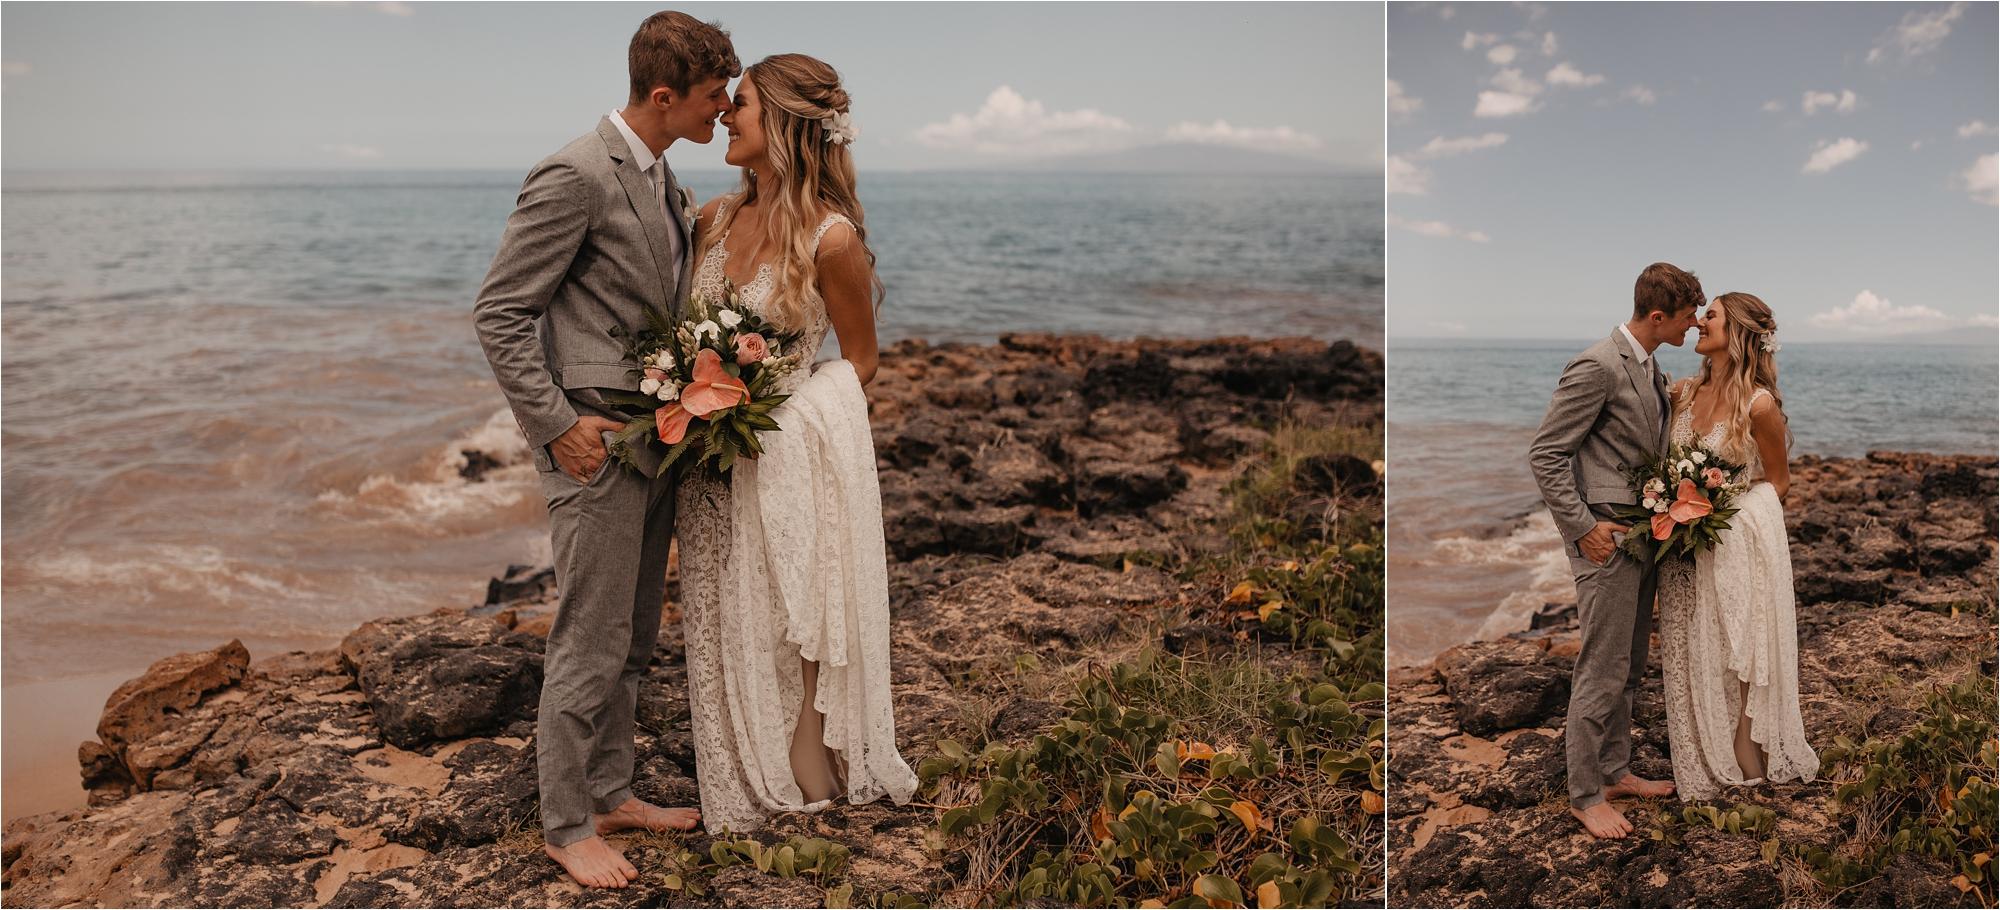 maui-hawaii-intimate-tropical-wedding_0071.jpg